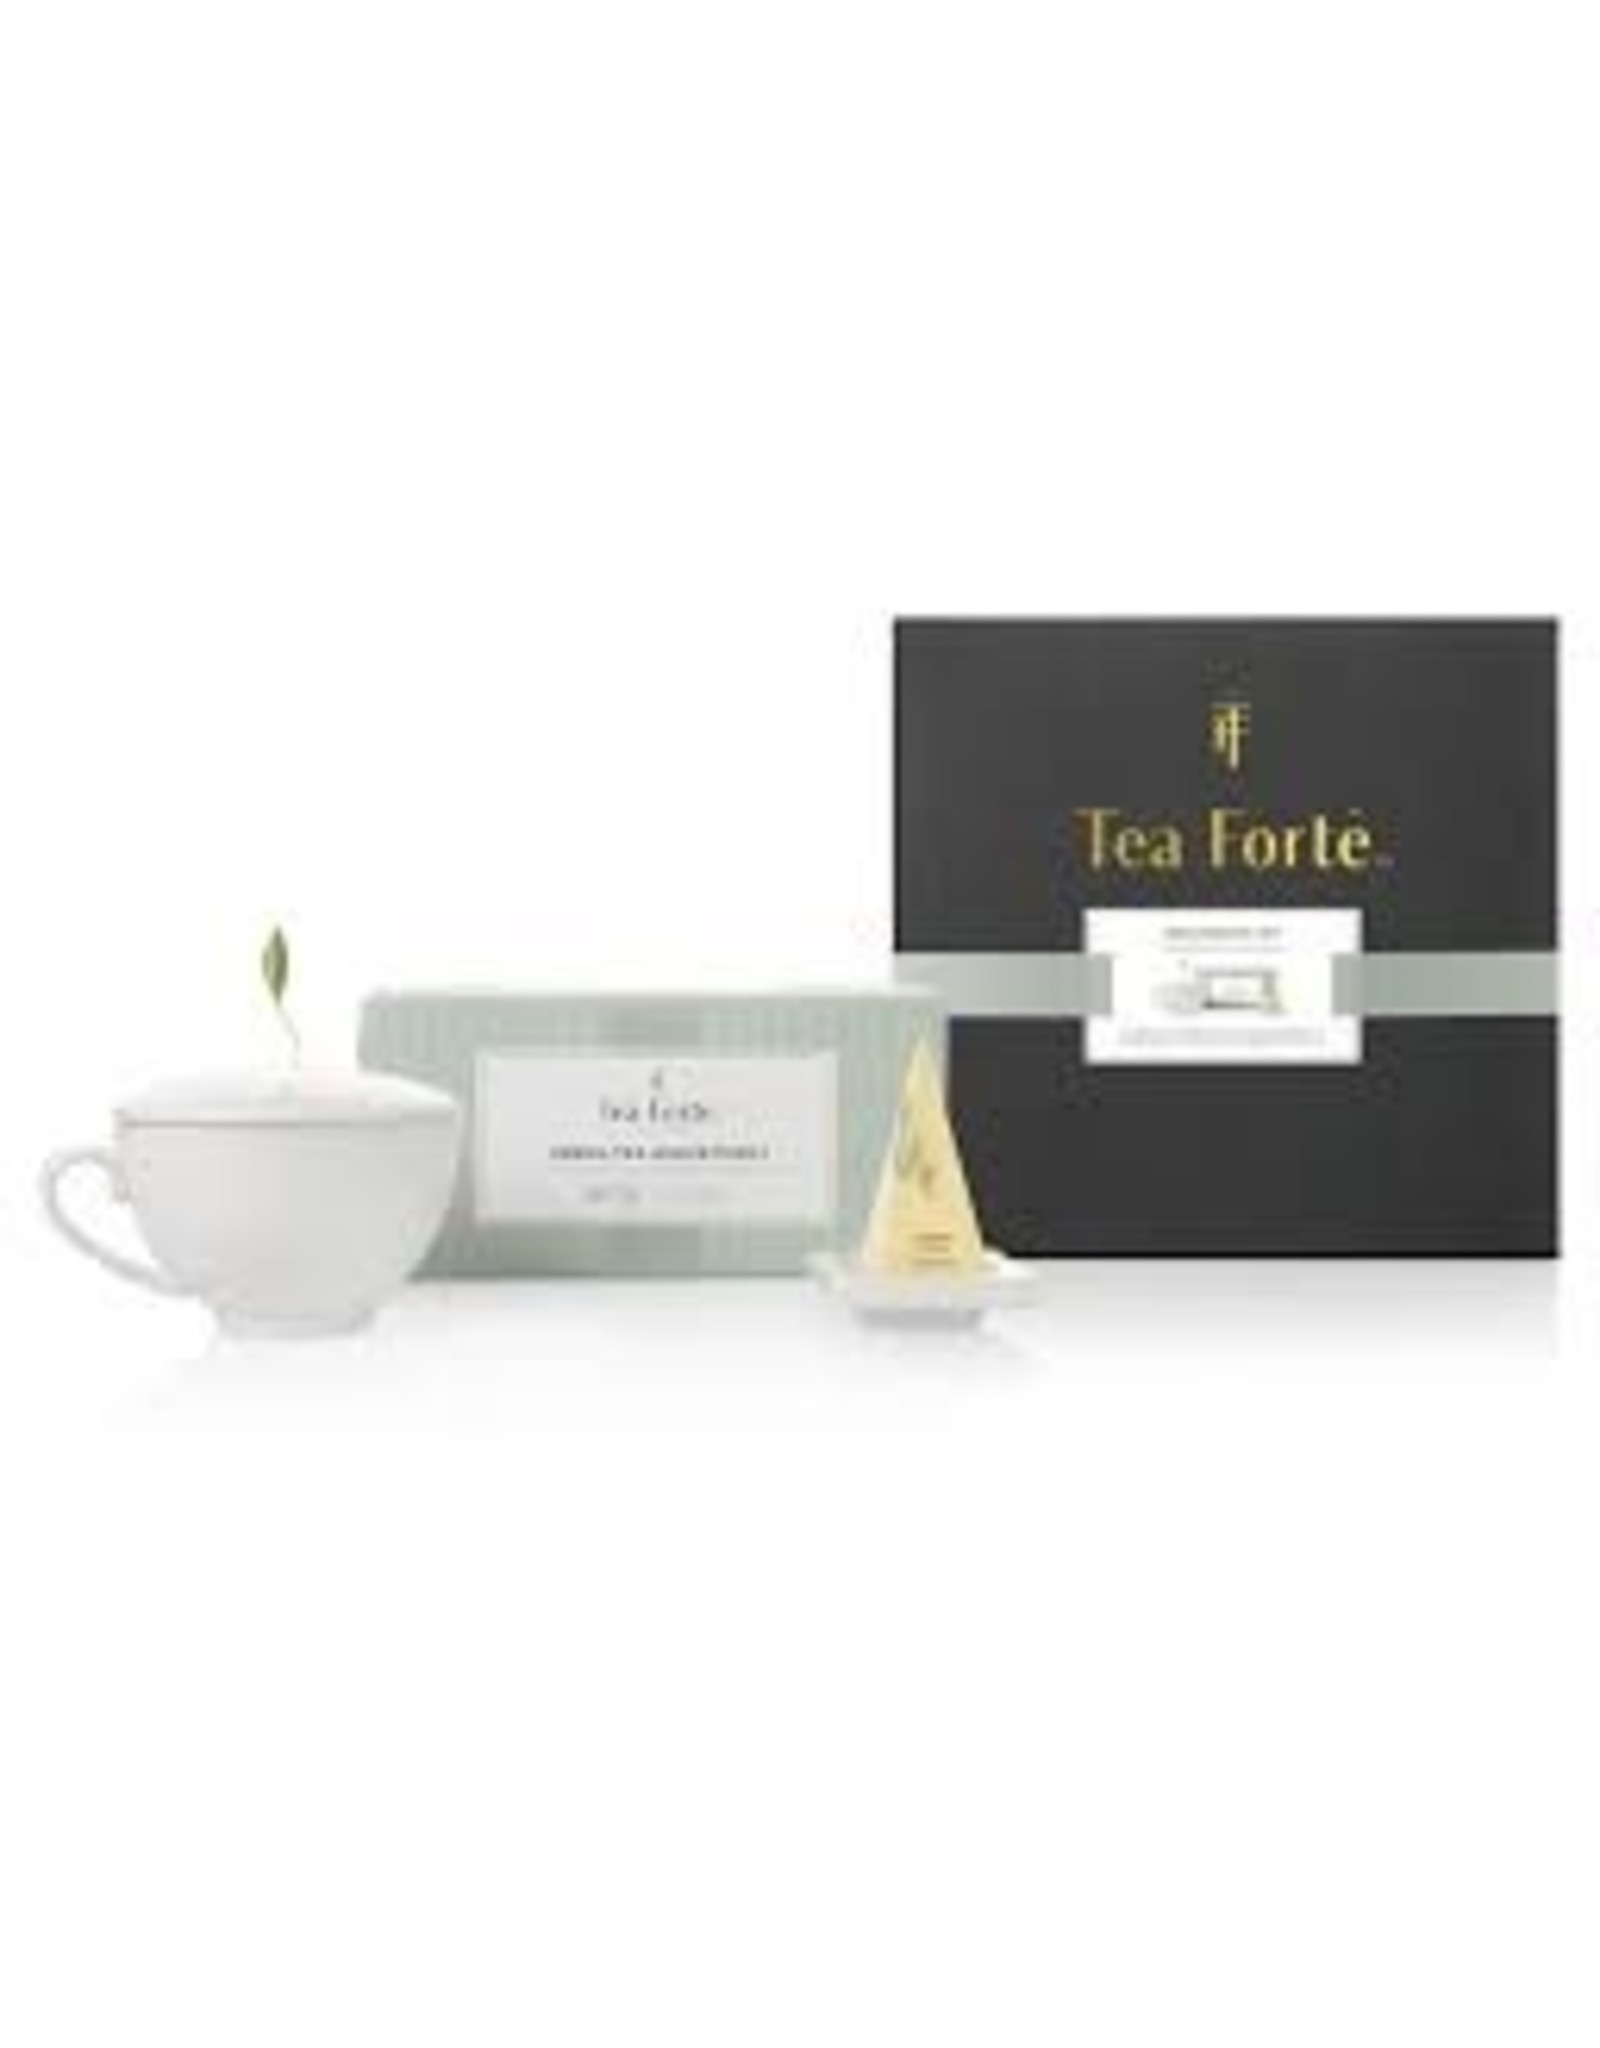 Tea Tea Forte GIFT SET - Rejuvenation